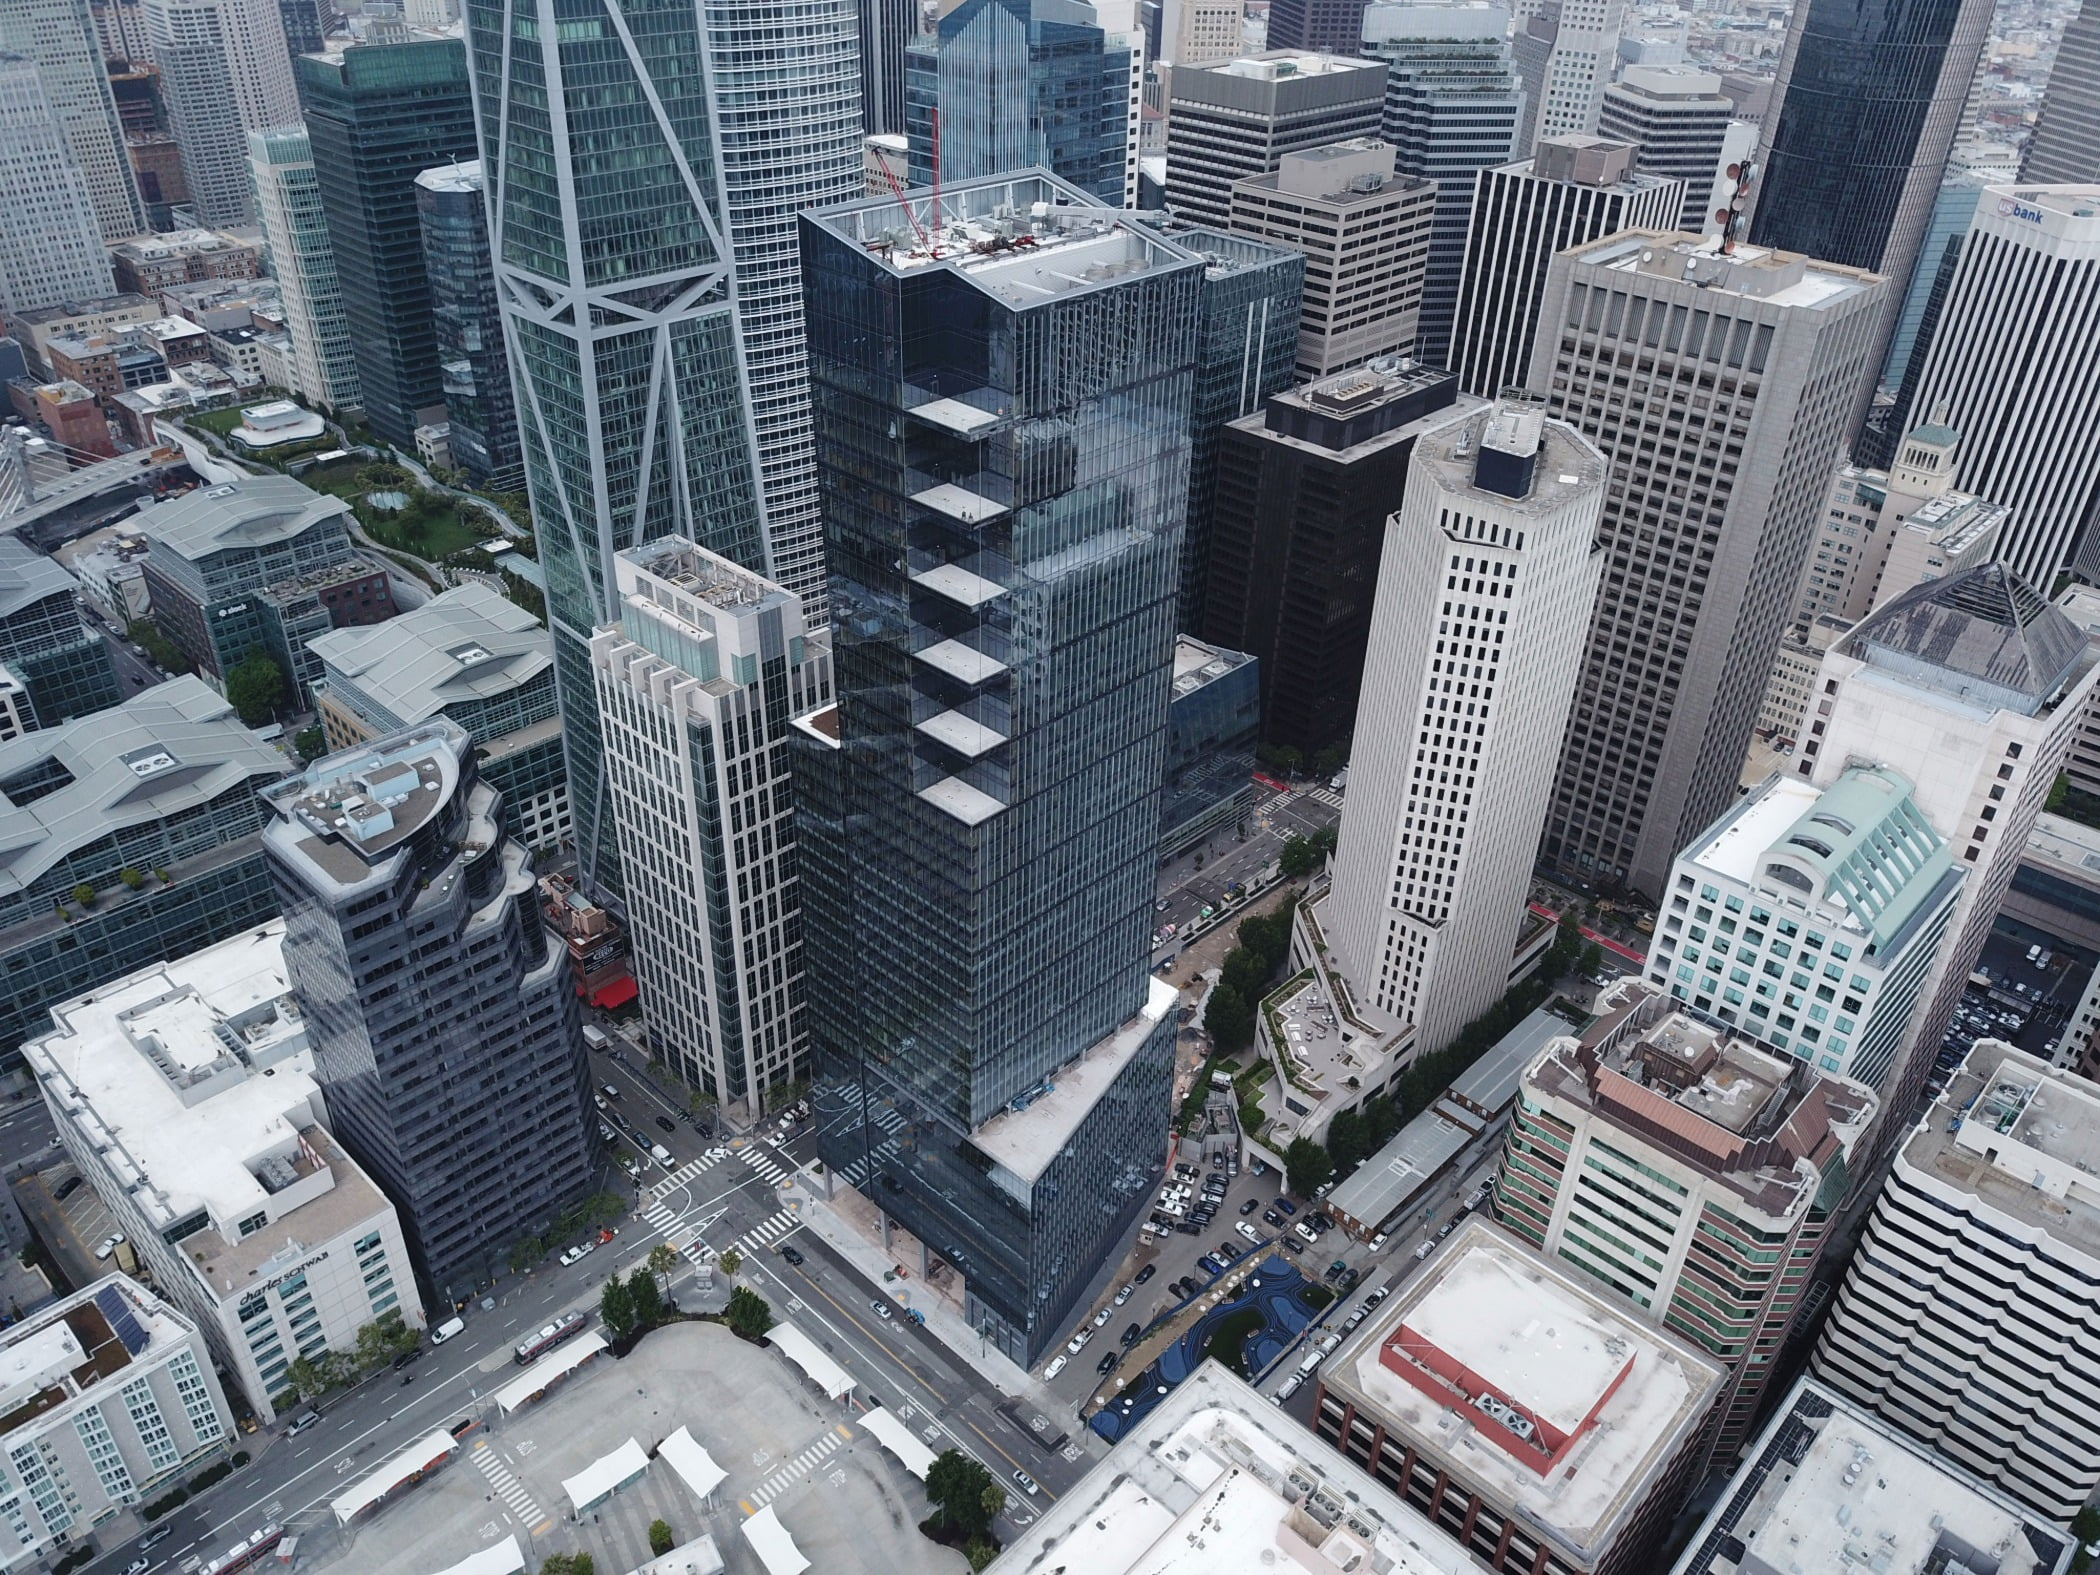 Human settlement, Commercial building, Tower block, Urban area, Cityscape, Skyscraper, City, Metropolis